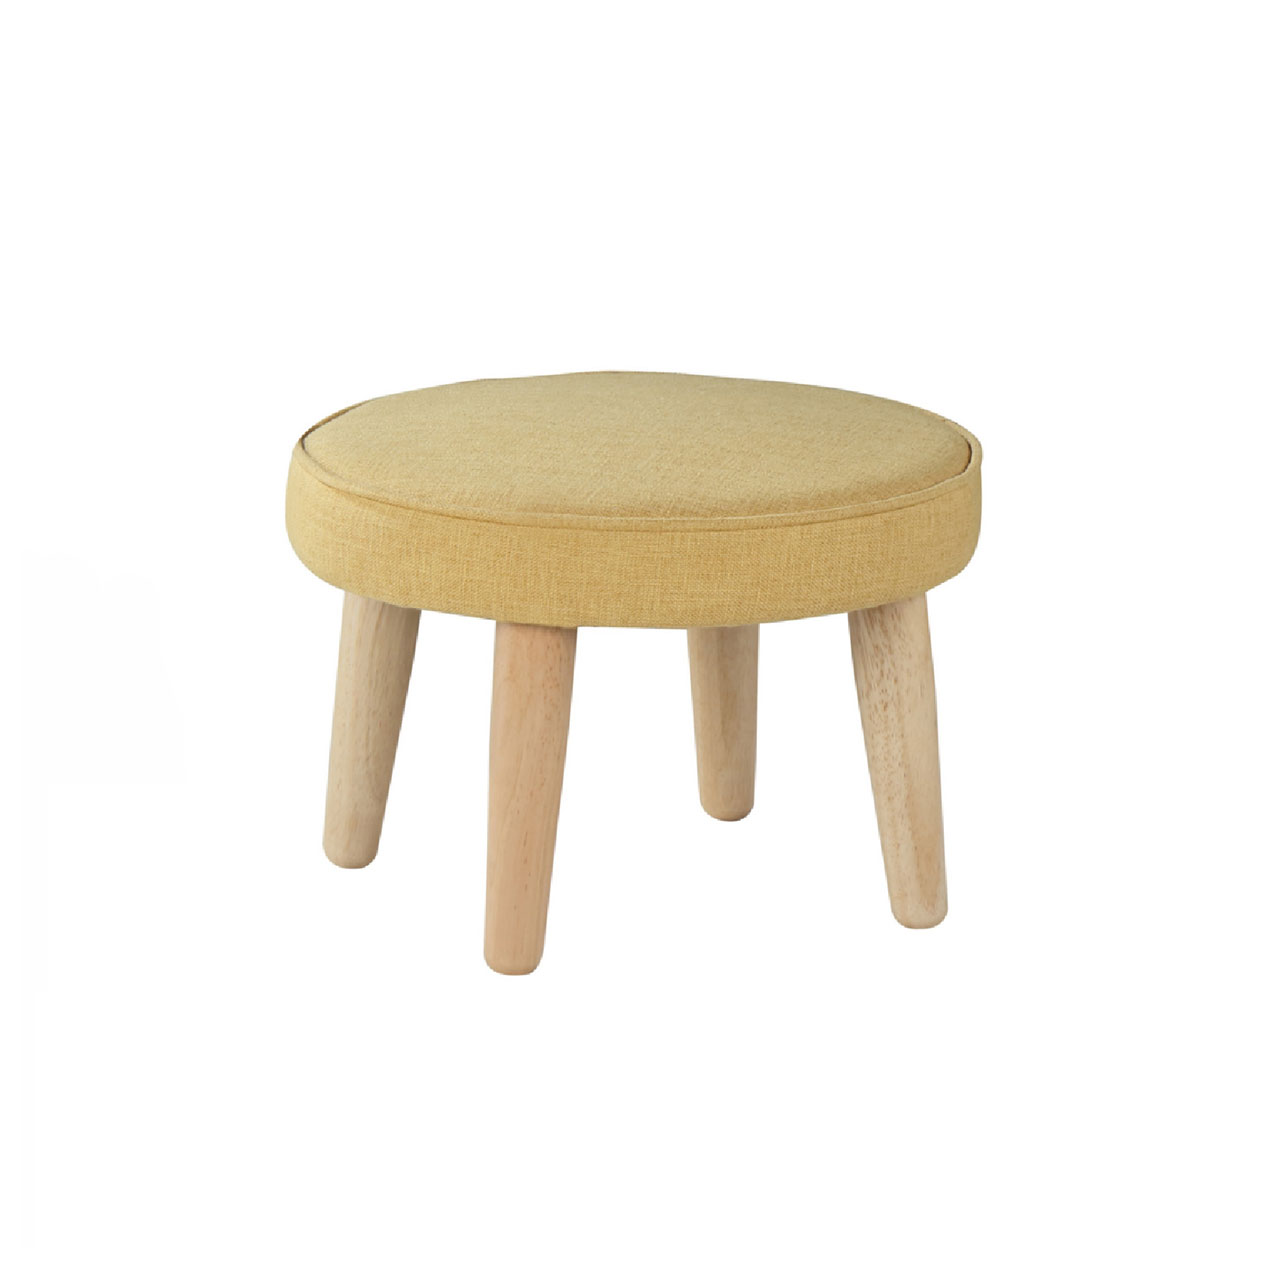 stool chair ph exercise gif ophelia furniture store manila philippines urban